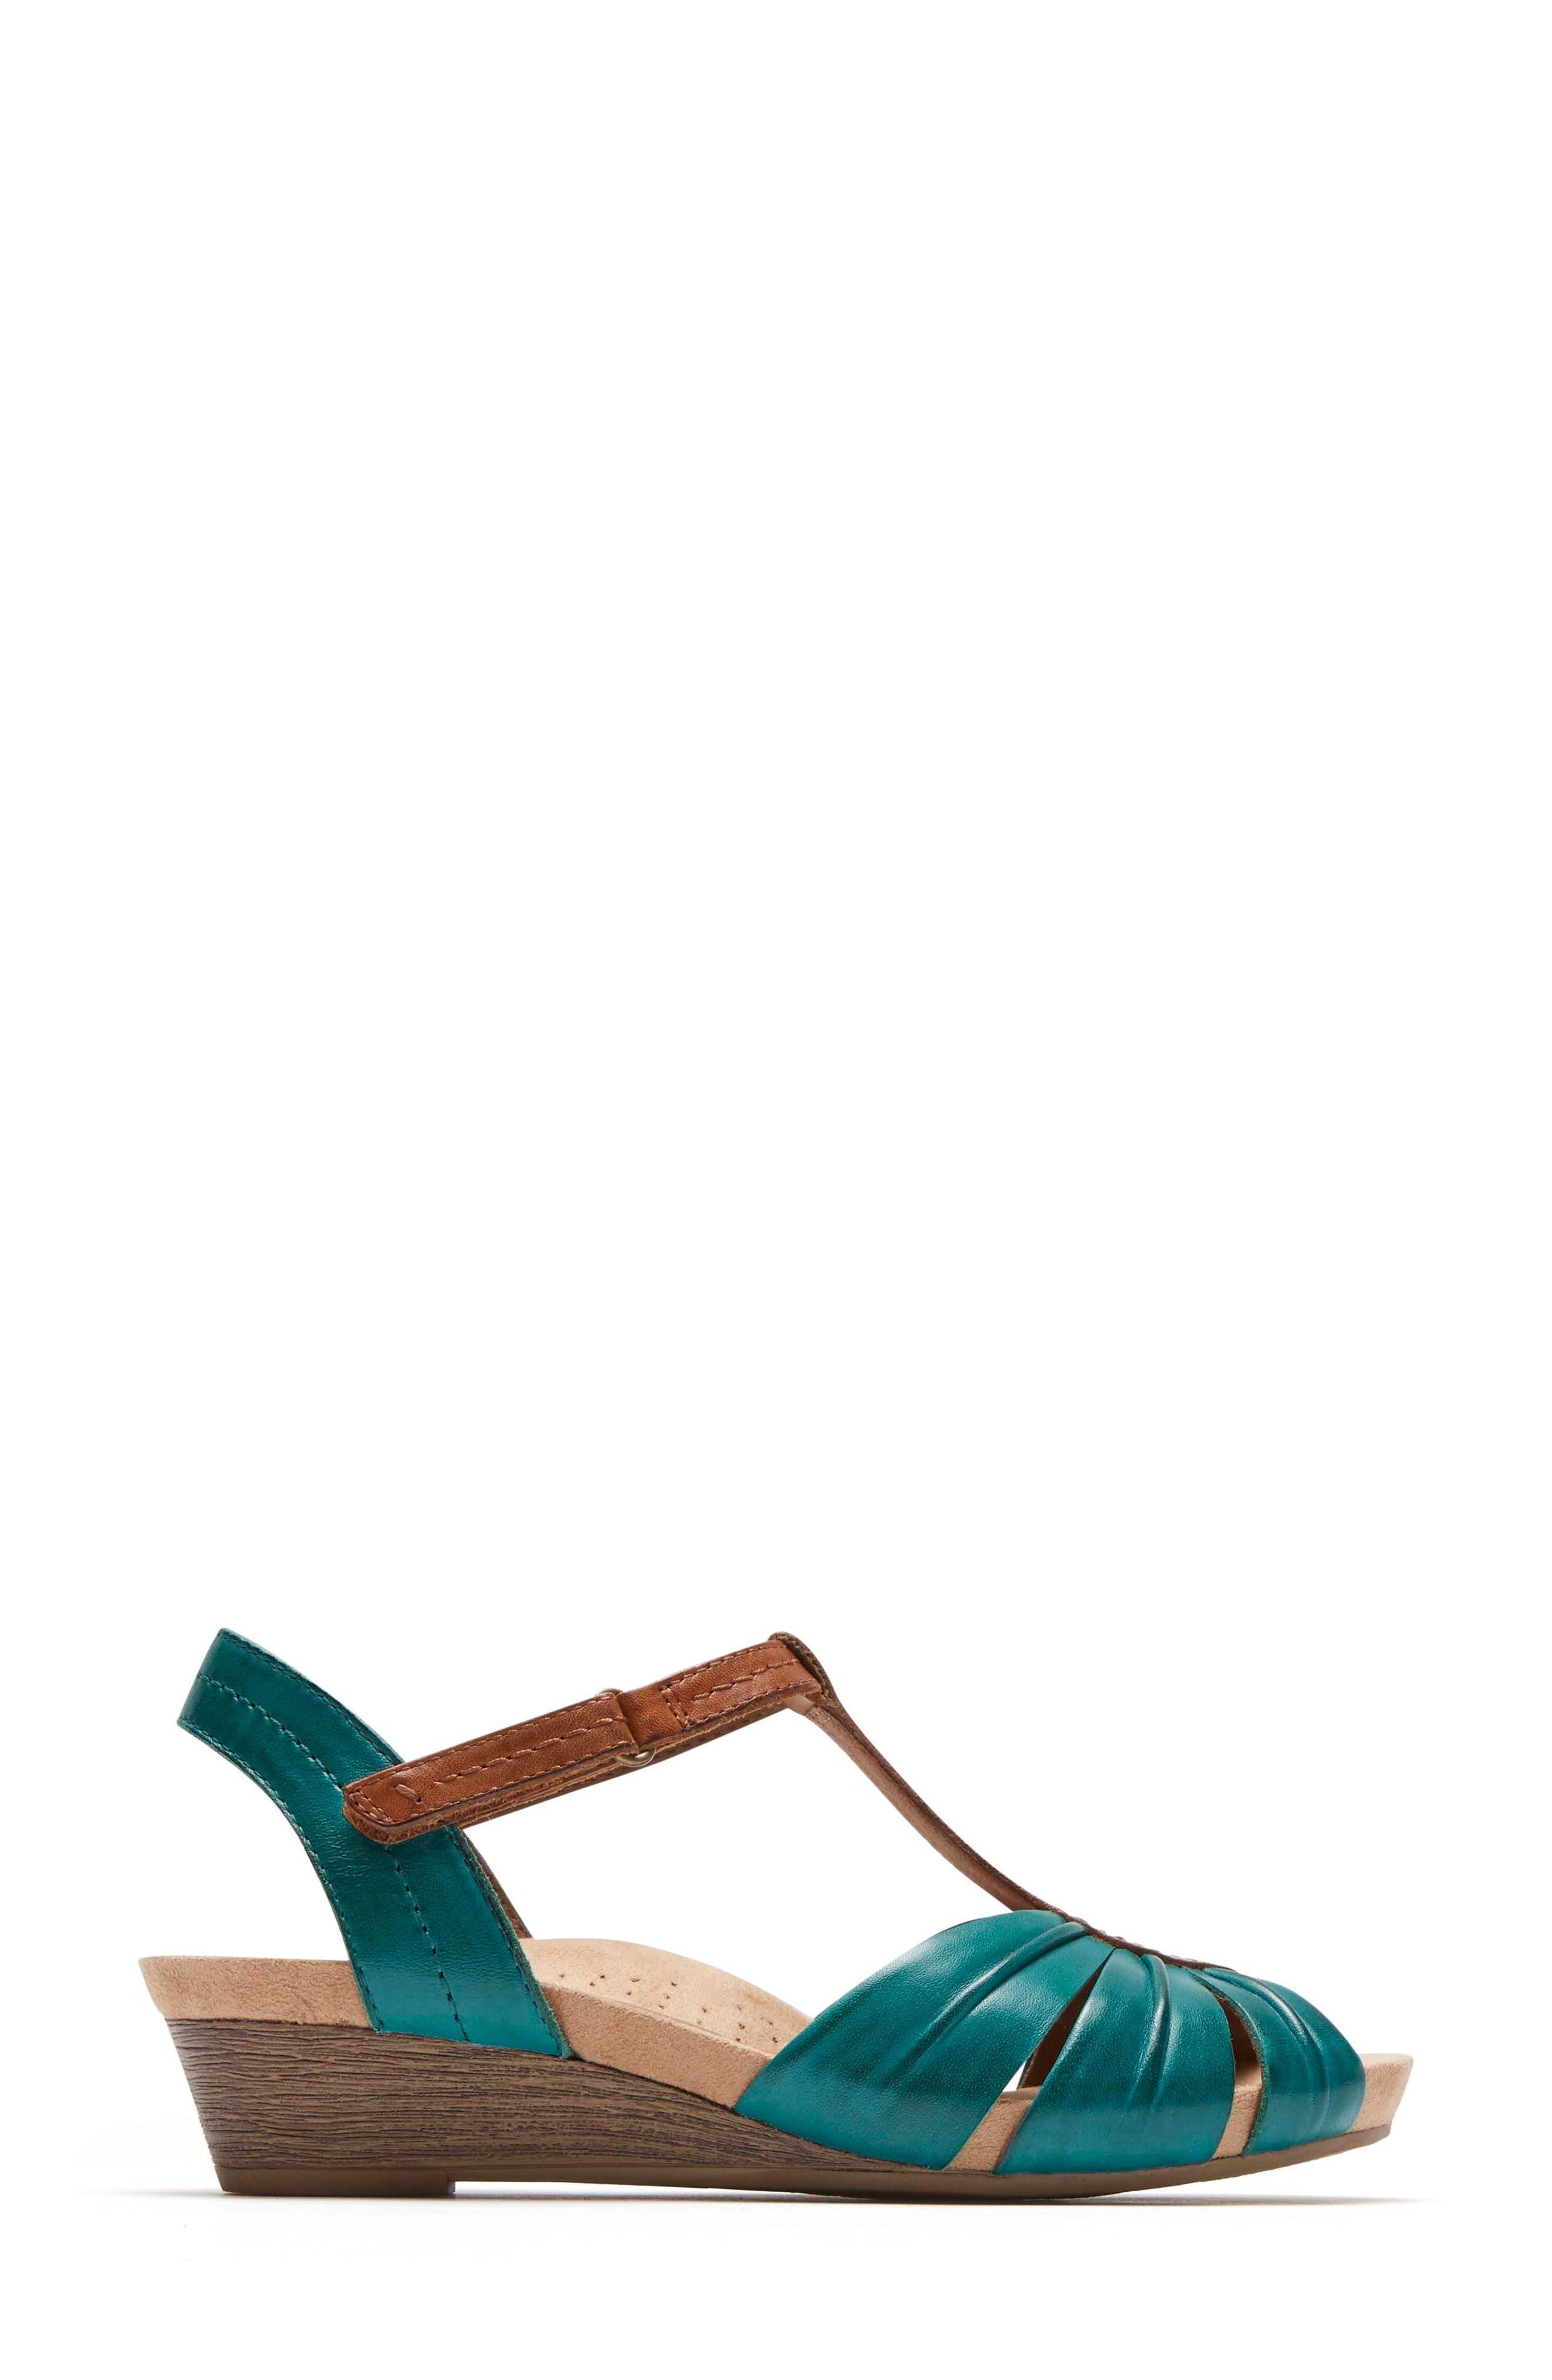 Hollywood Pleat Wedge Sandal,                             Alternate thumbnail 3, color,                             LAGOON LEATHER